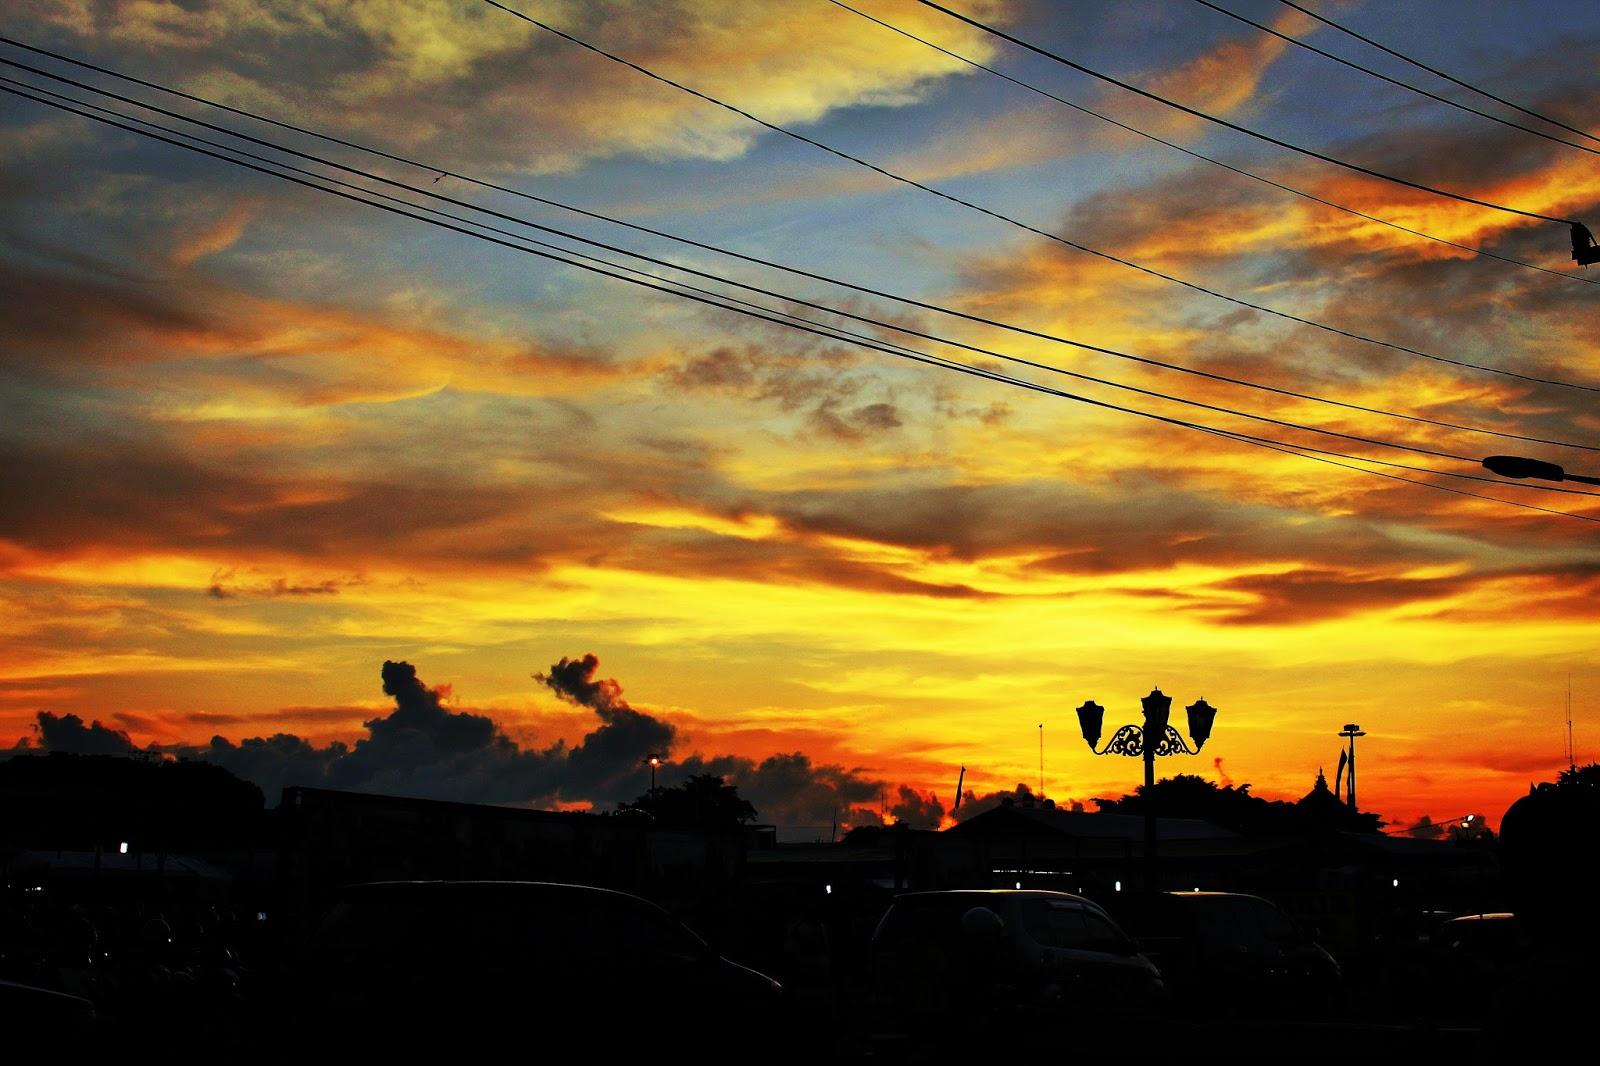 Contoh Lukisan Pemandangan Waktu Senja  Simak Gambar Berikut